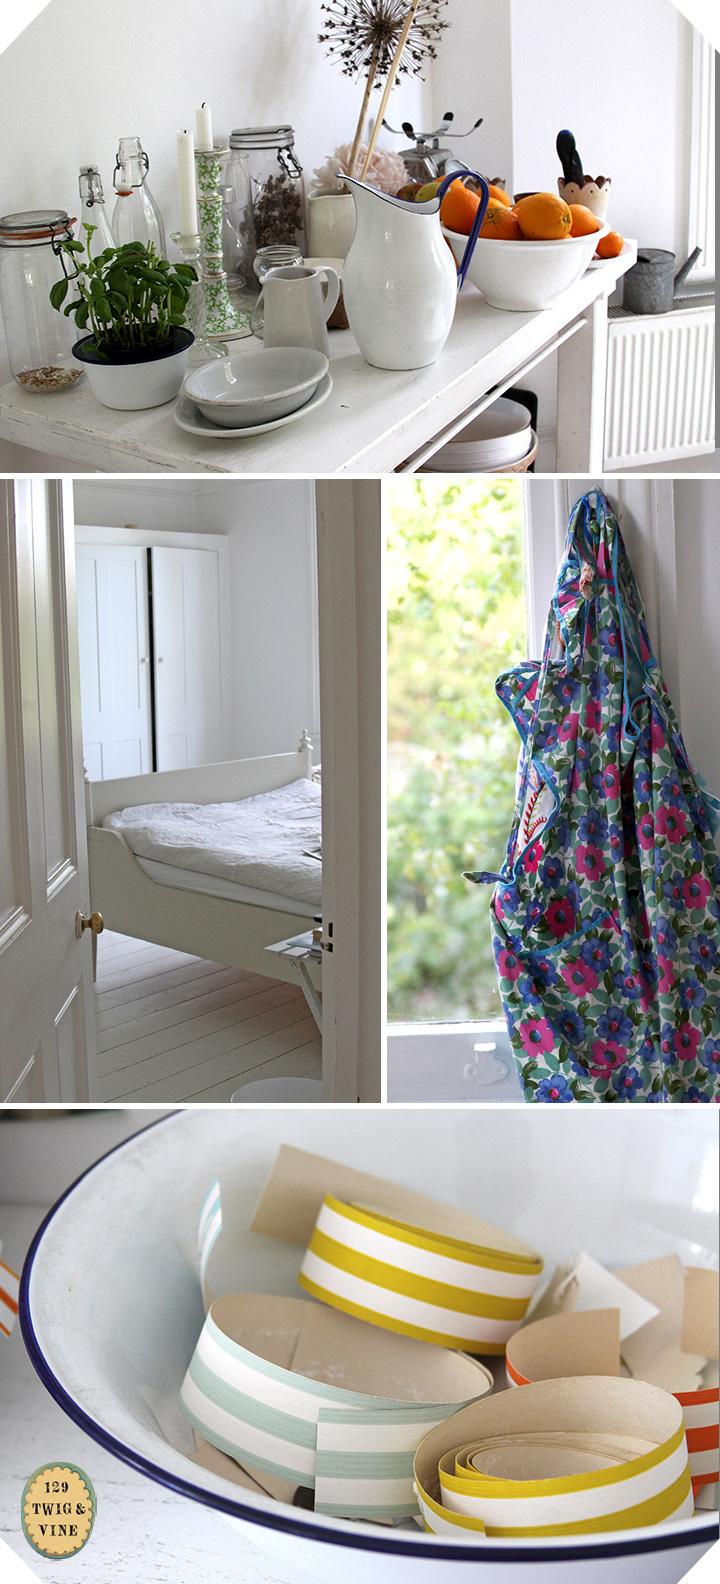 Jane Cumberbatch Home, Pure Style, photos ©Sue Schlabach www.129twigandvine.com